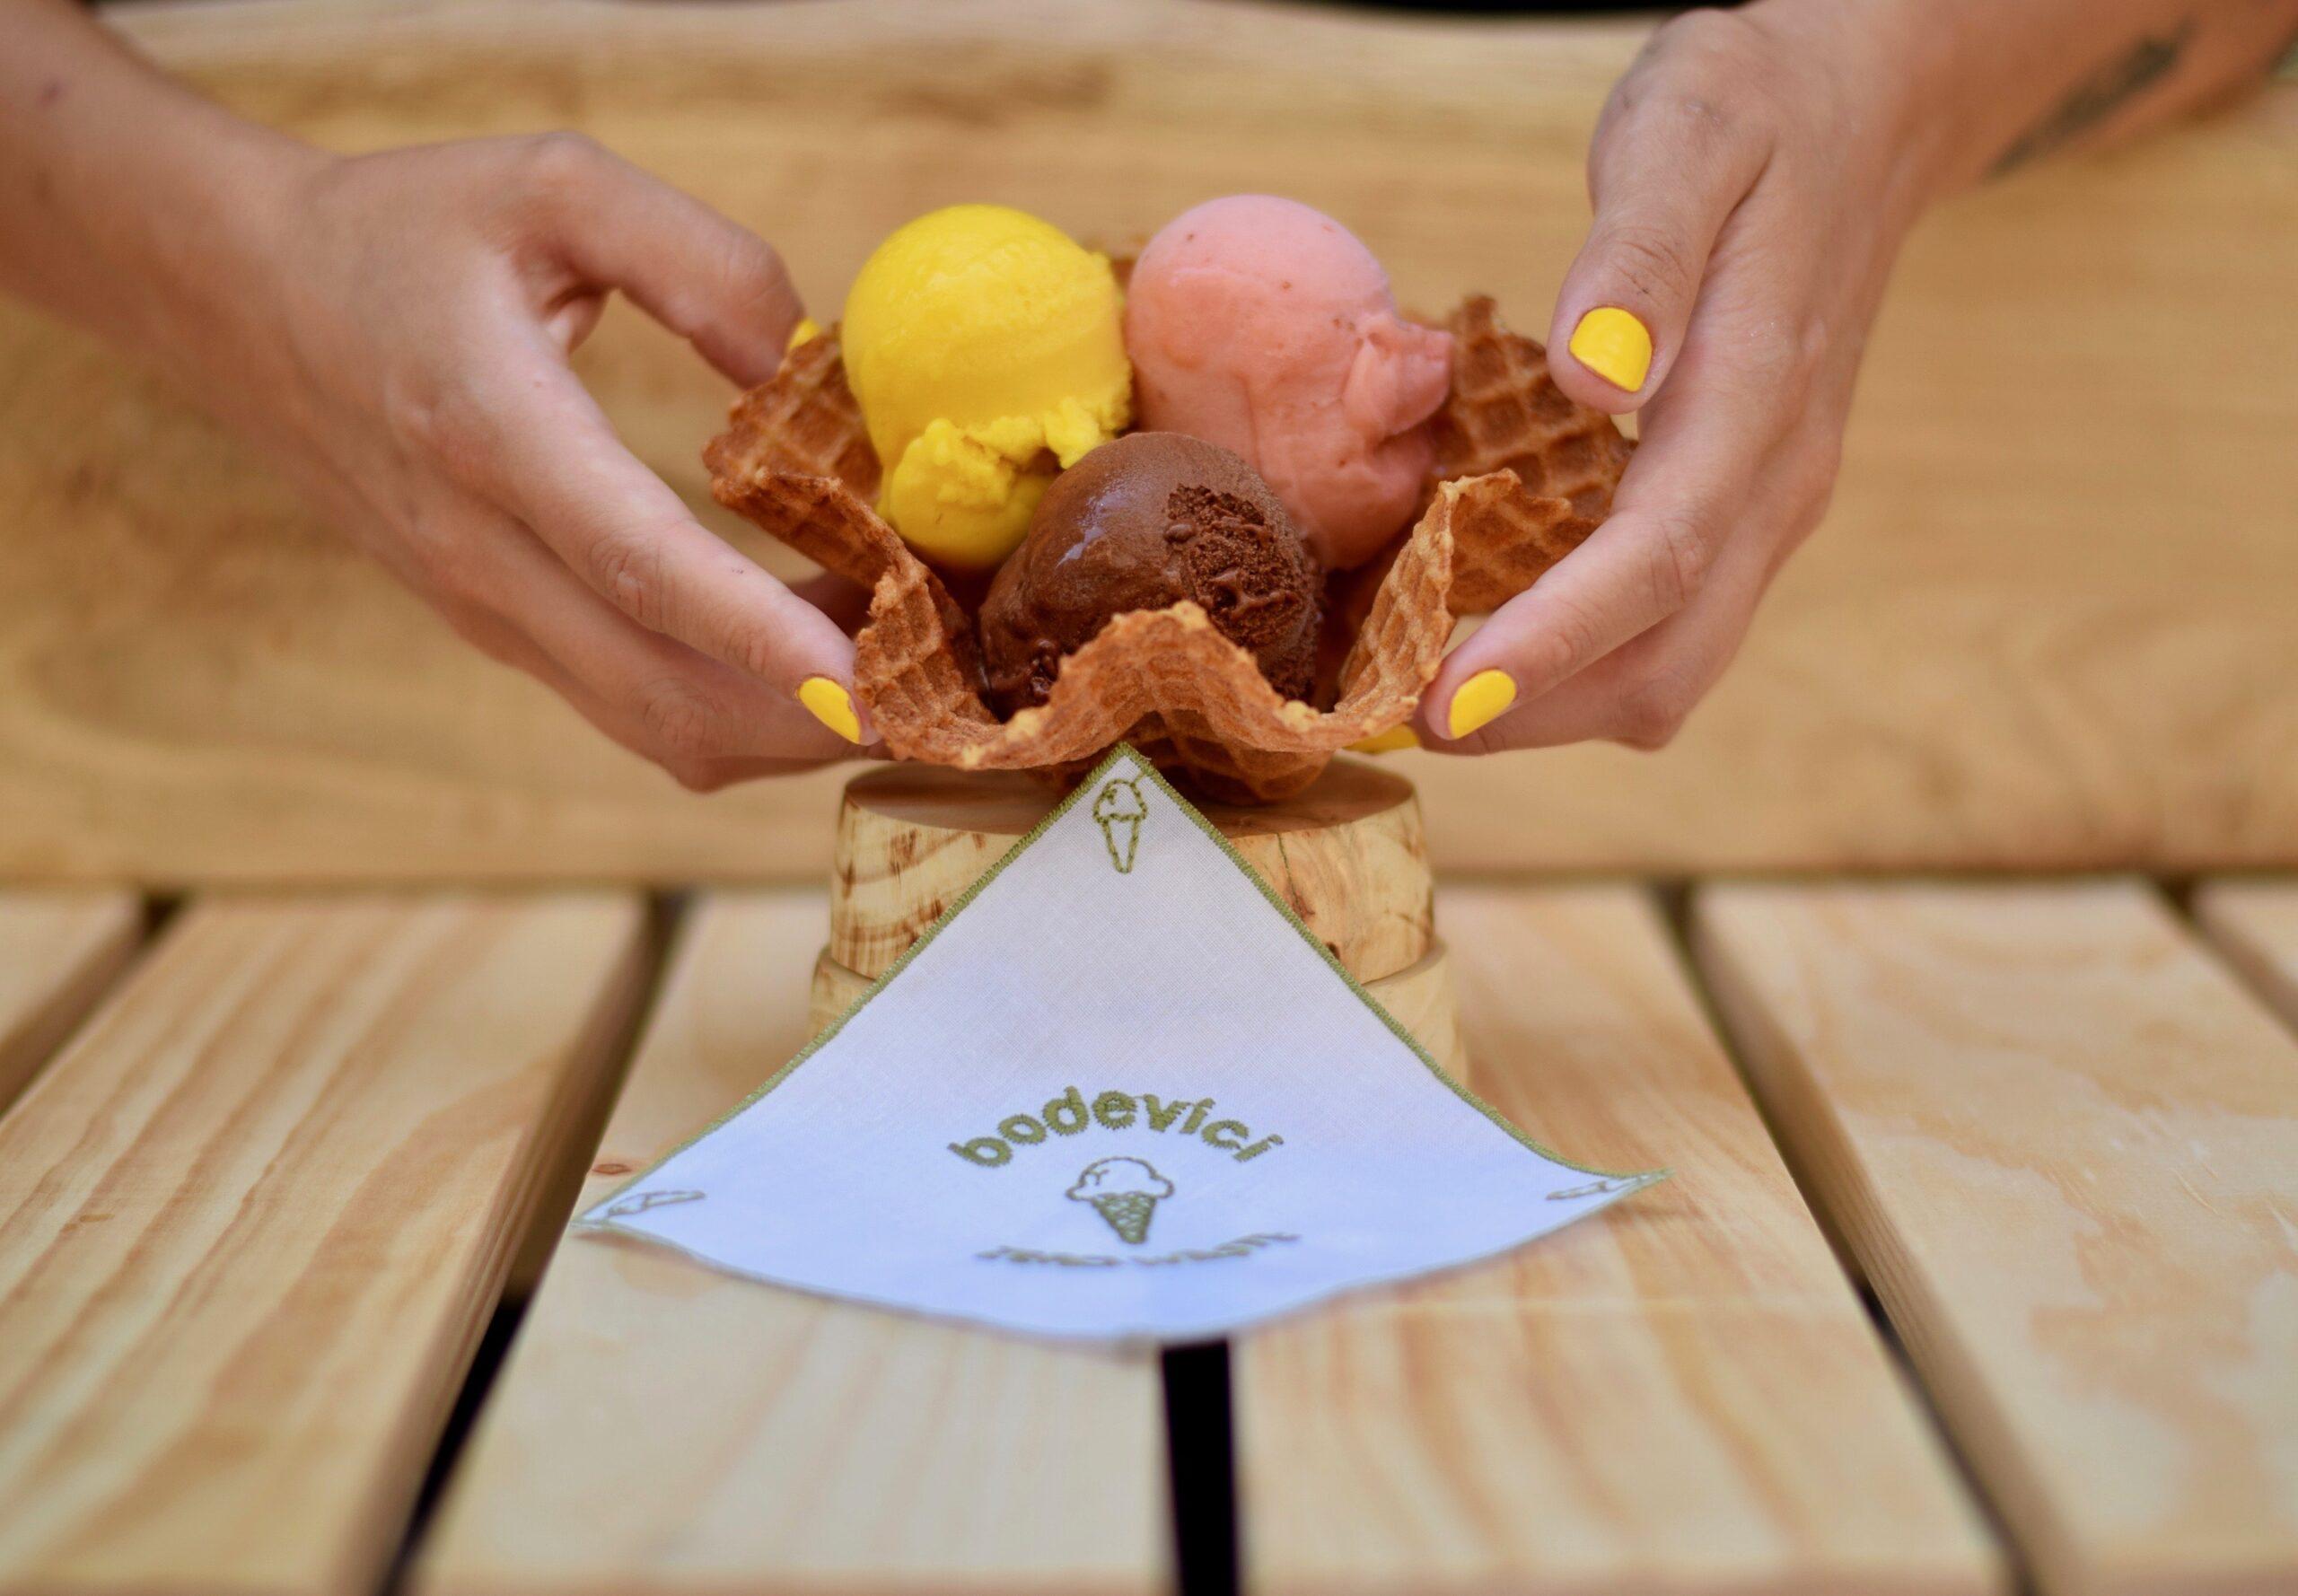 Gelats de la gelateria Bodevici | Cedida